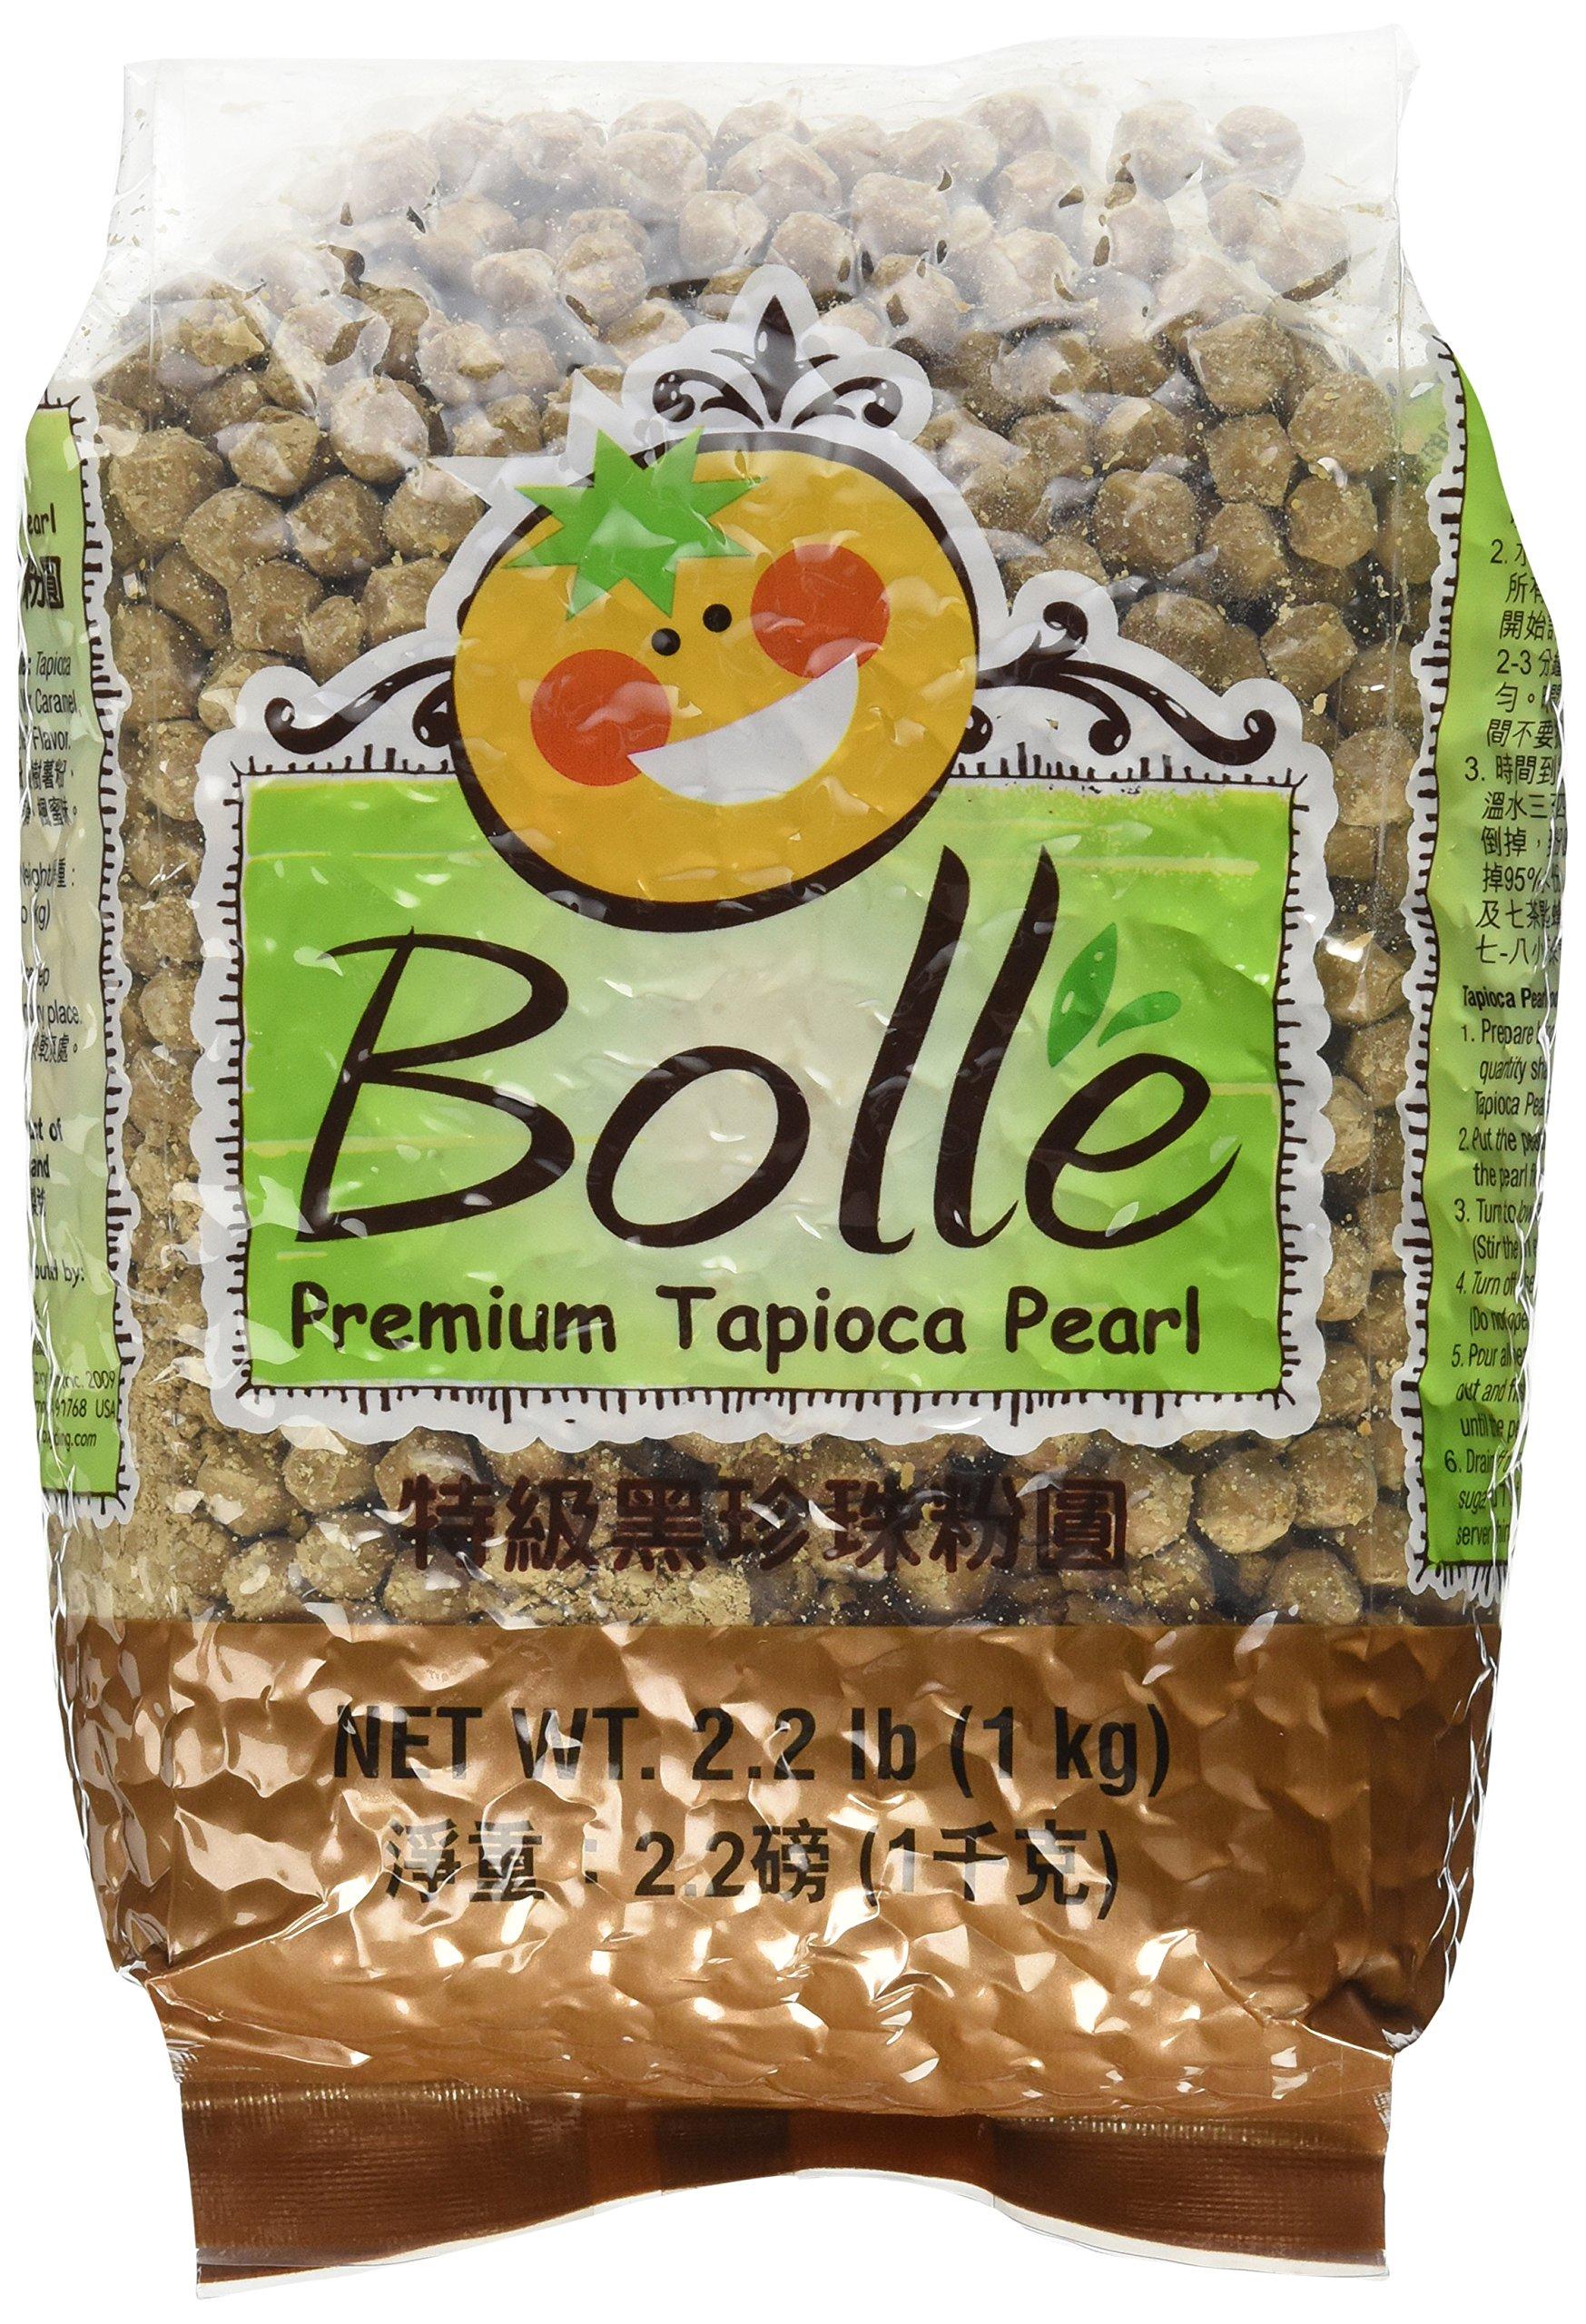 BOLLE - Boba Bubble Tea Tapioca Pearls 2.2 Lbs. by Bolle